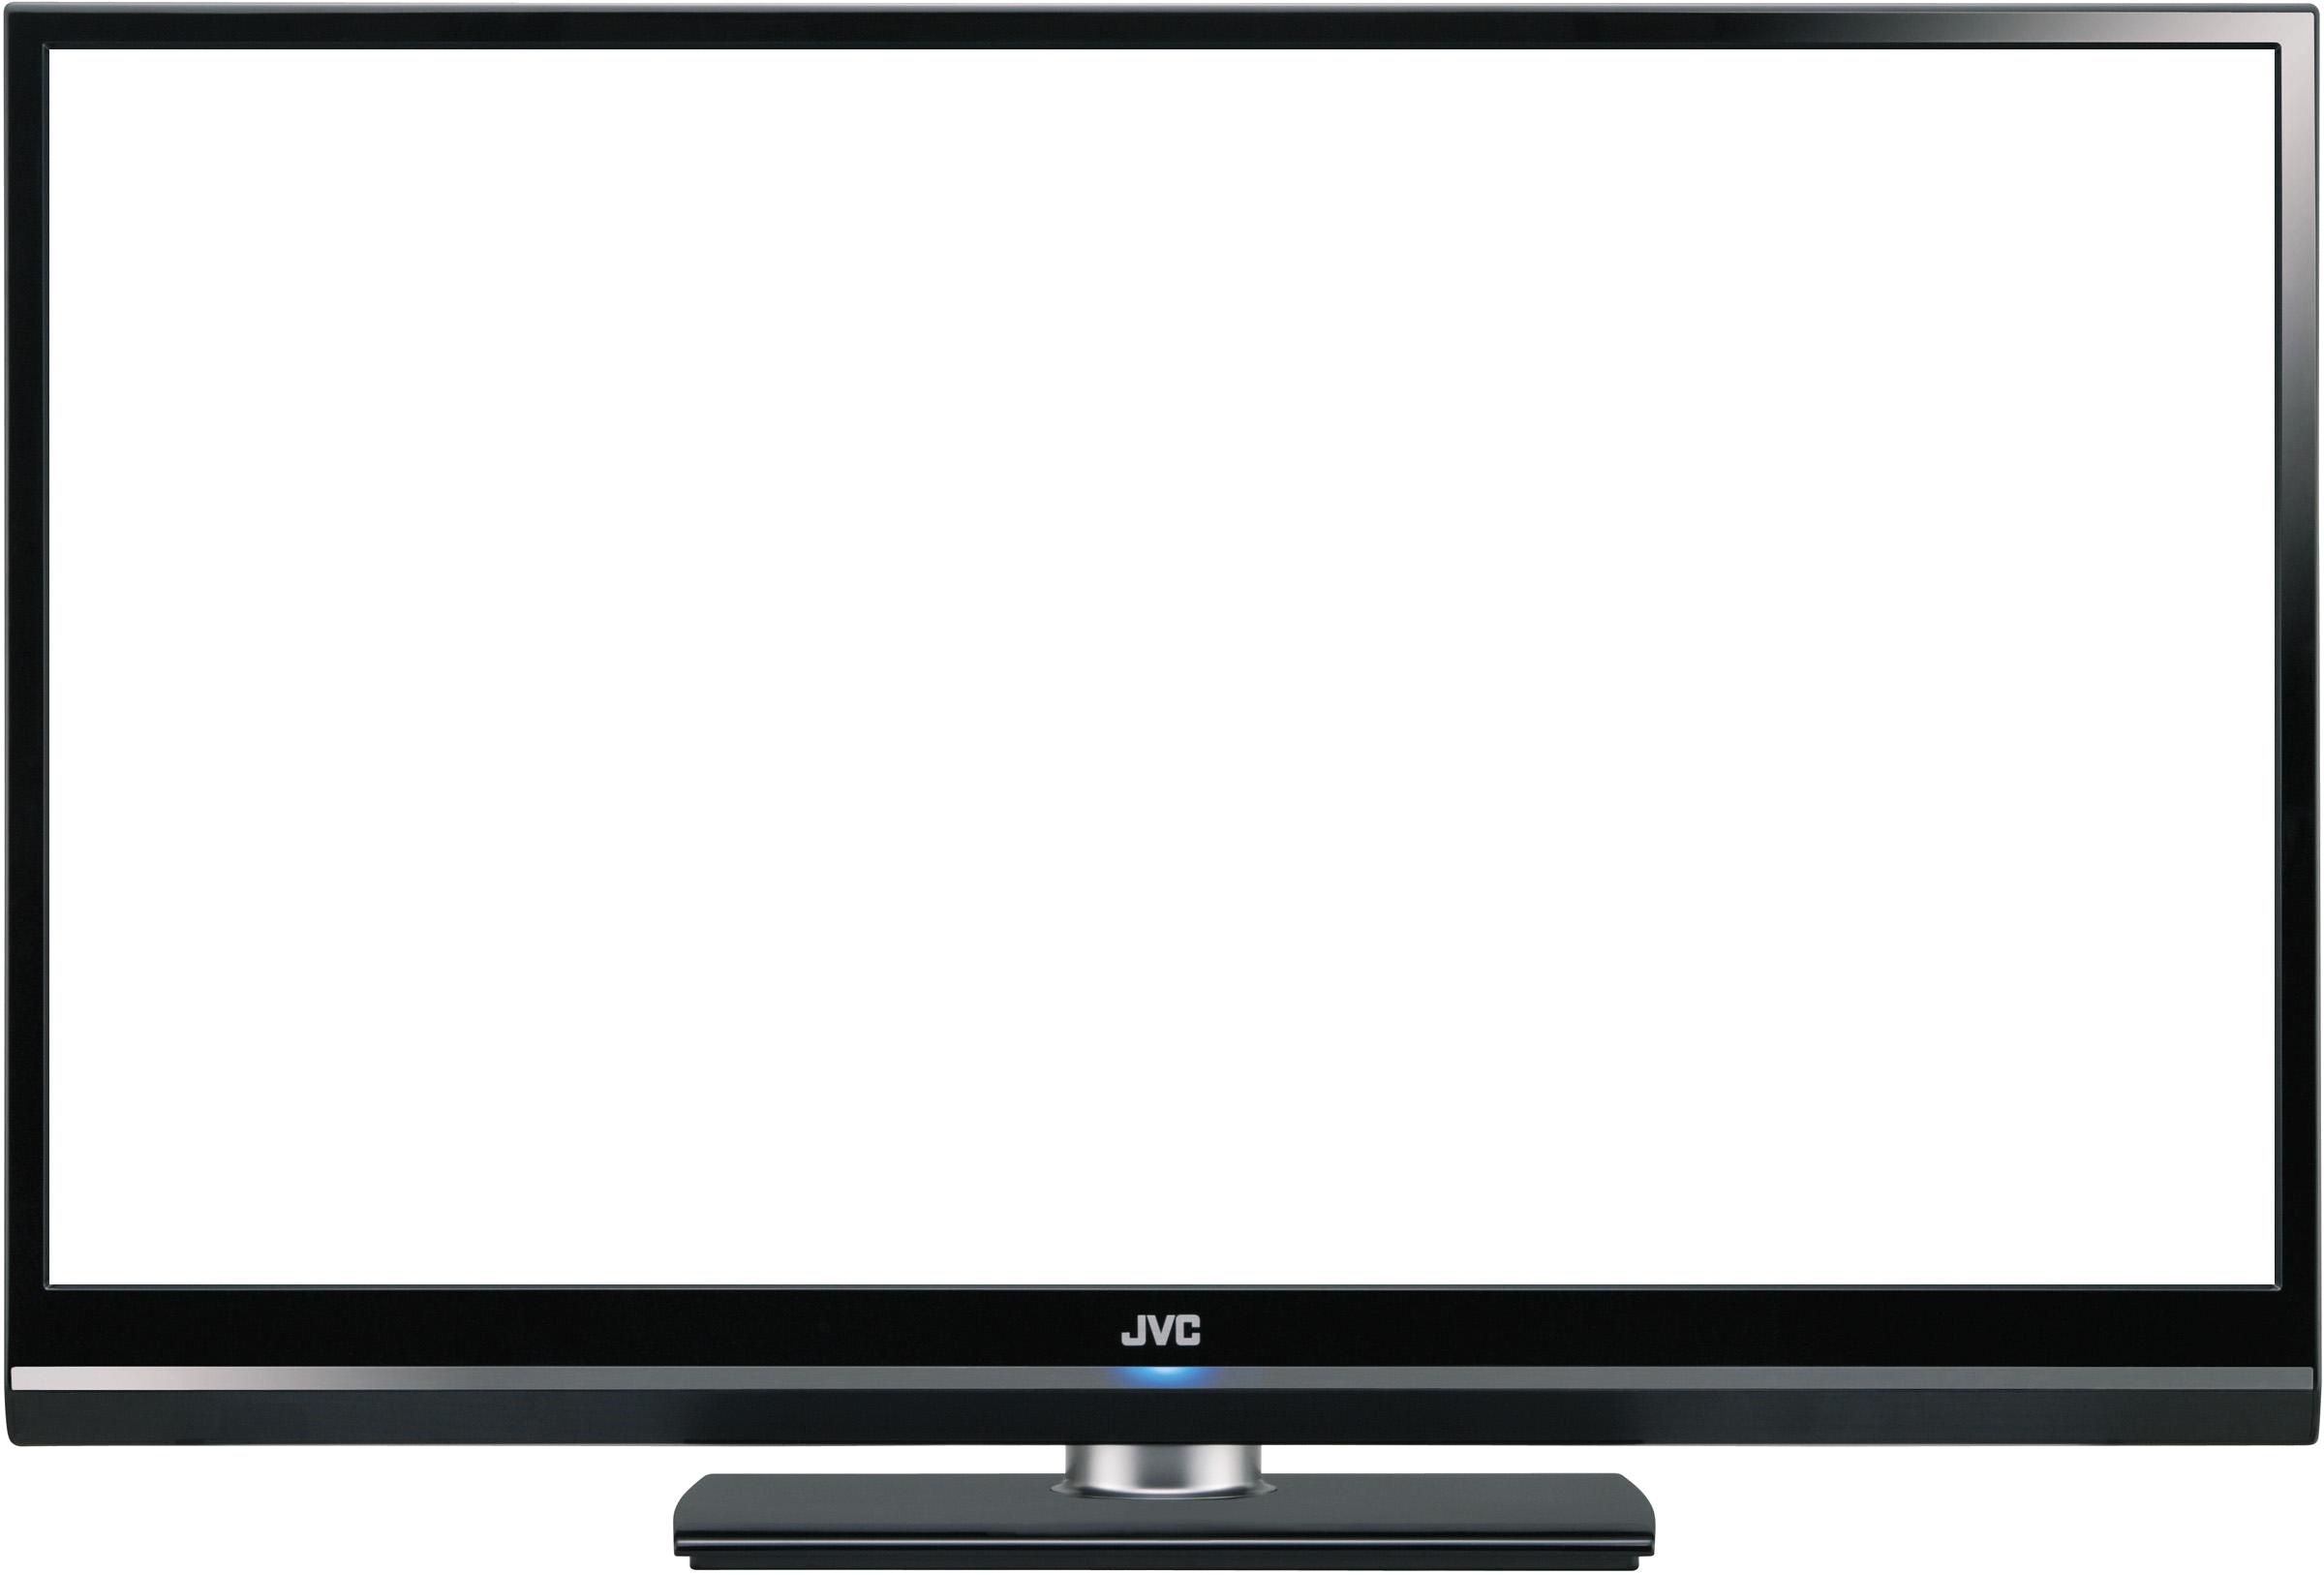 Widescreen clipart clip freeuse Plasma Tv Clipart | Free download best Plasma Tv Clipart on ... clip freeuse